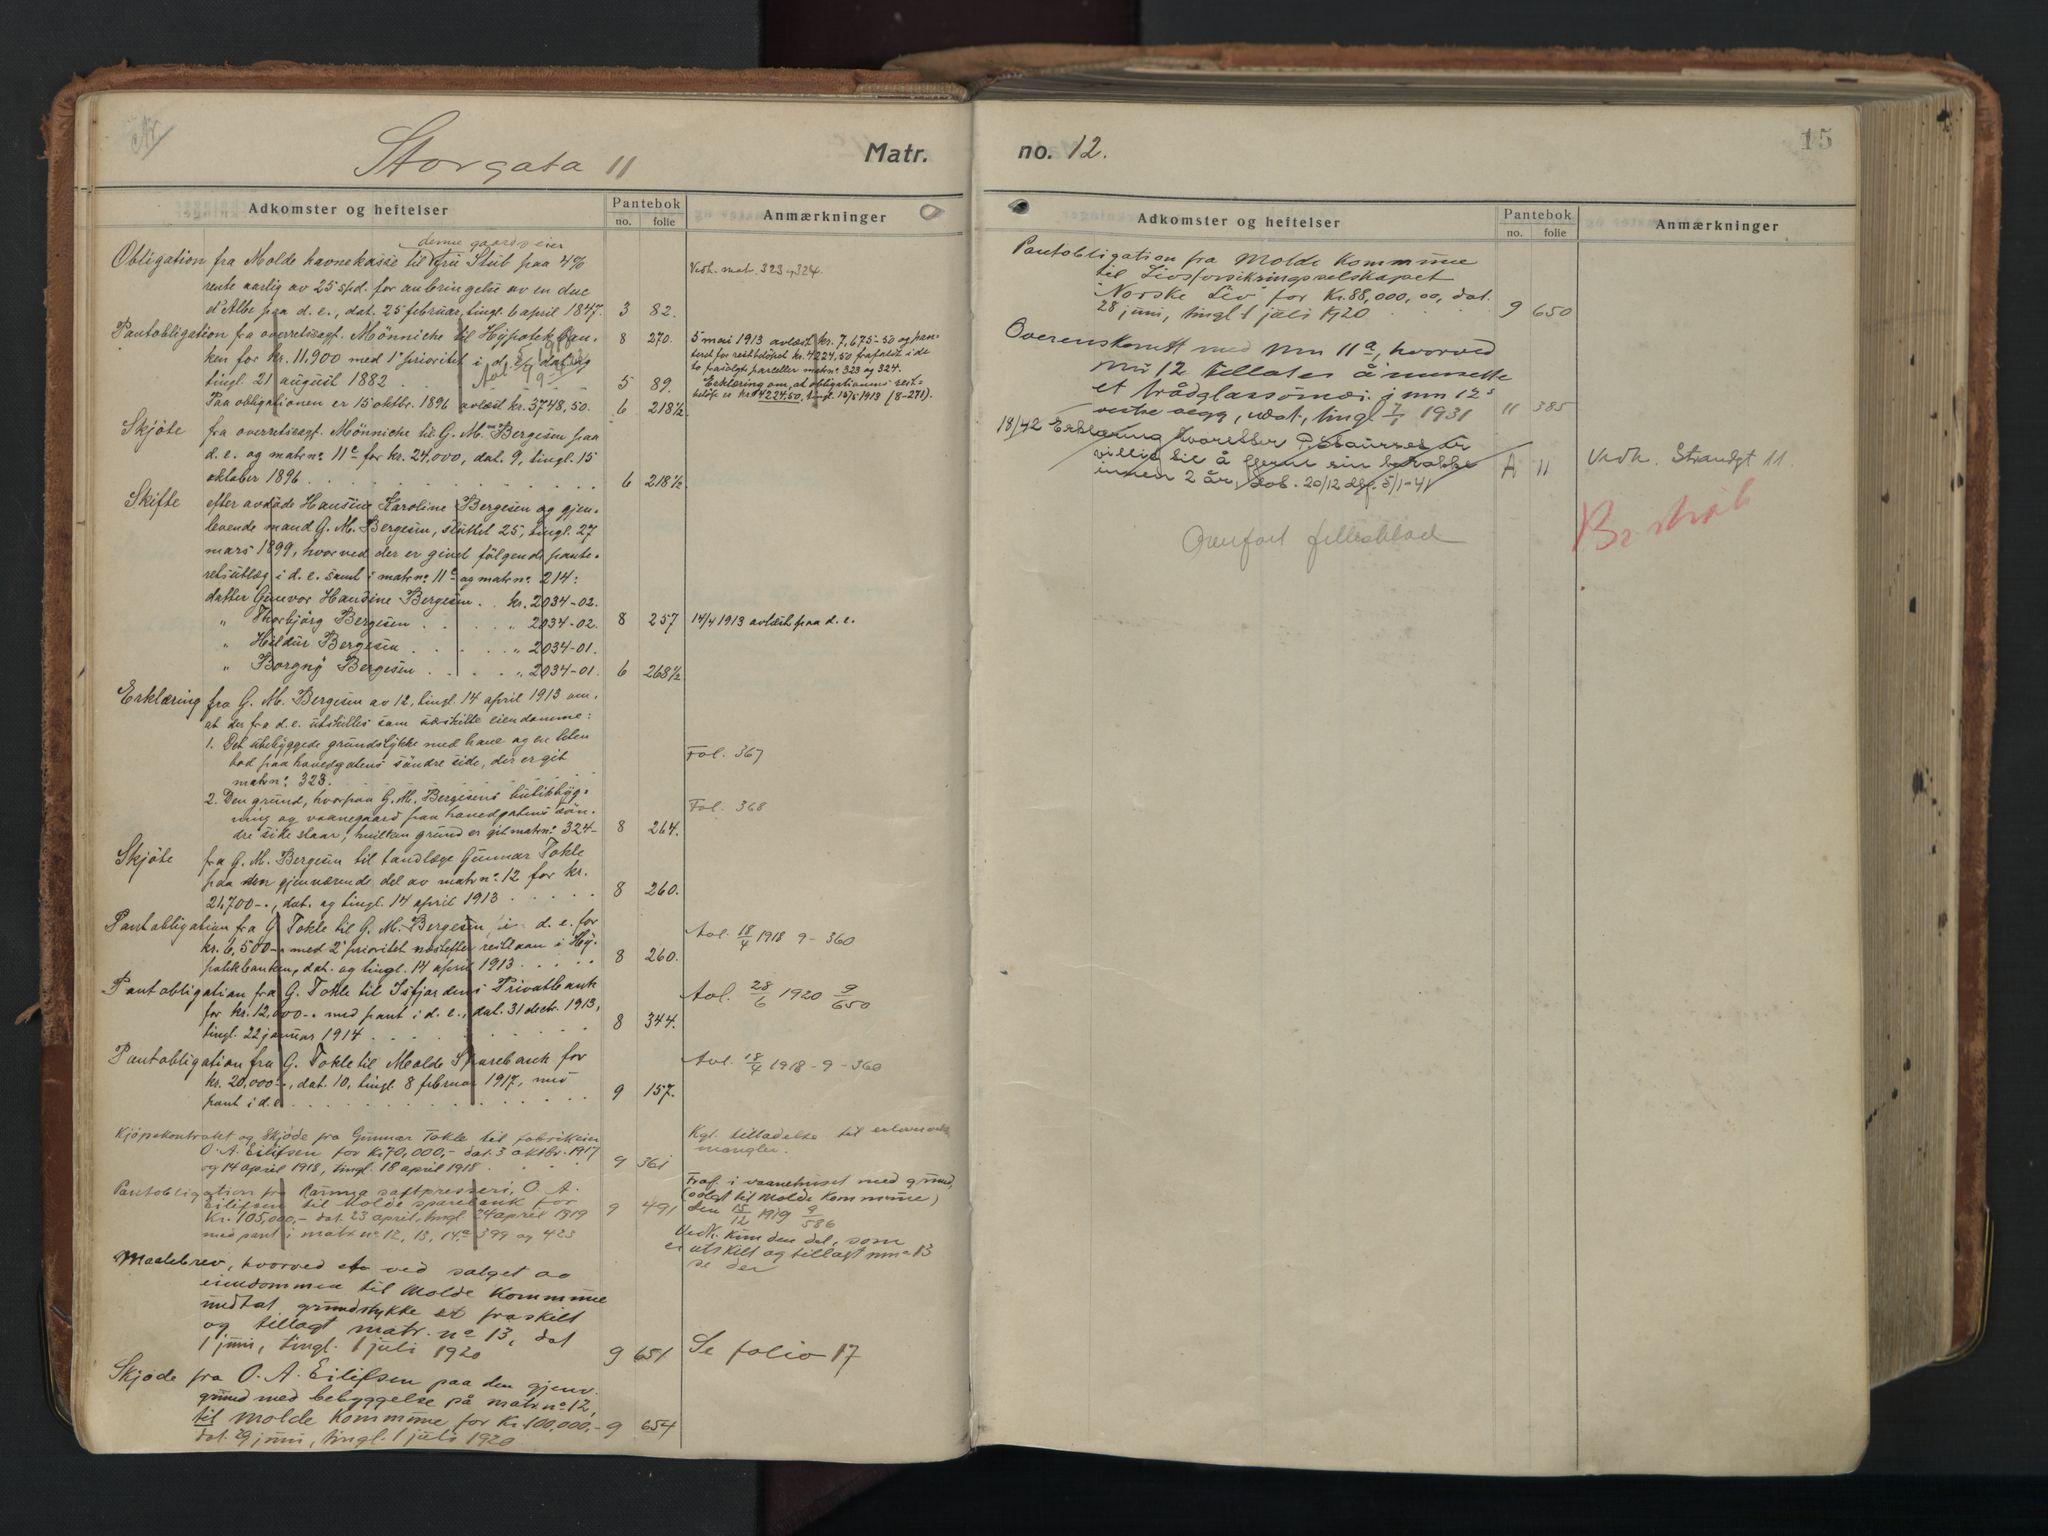 SAT, Molde byfogd, 2/2A/L0006: Mortgage register no. 6, 1835-1835, p. 15